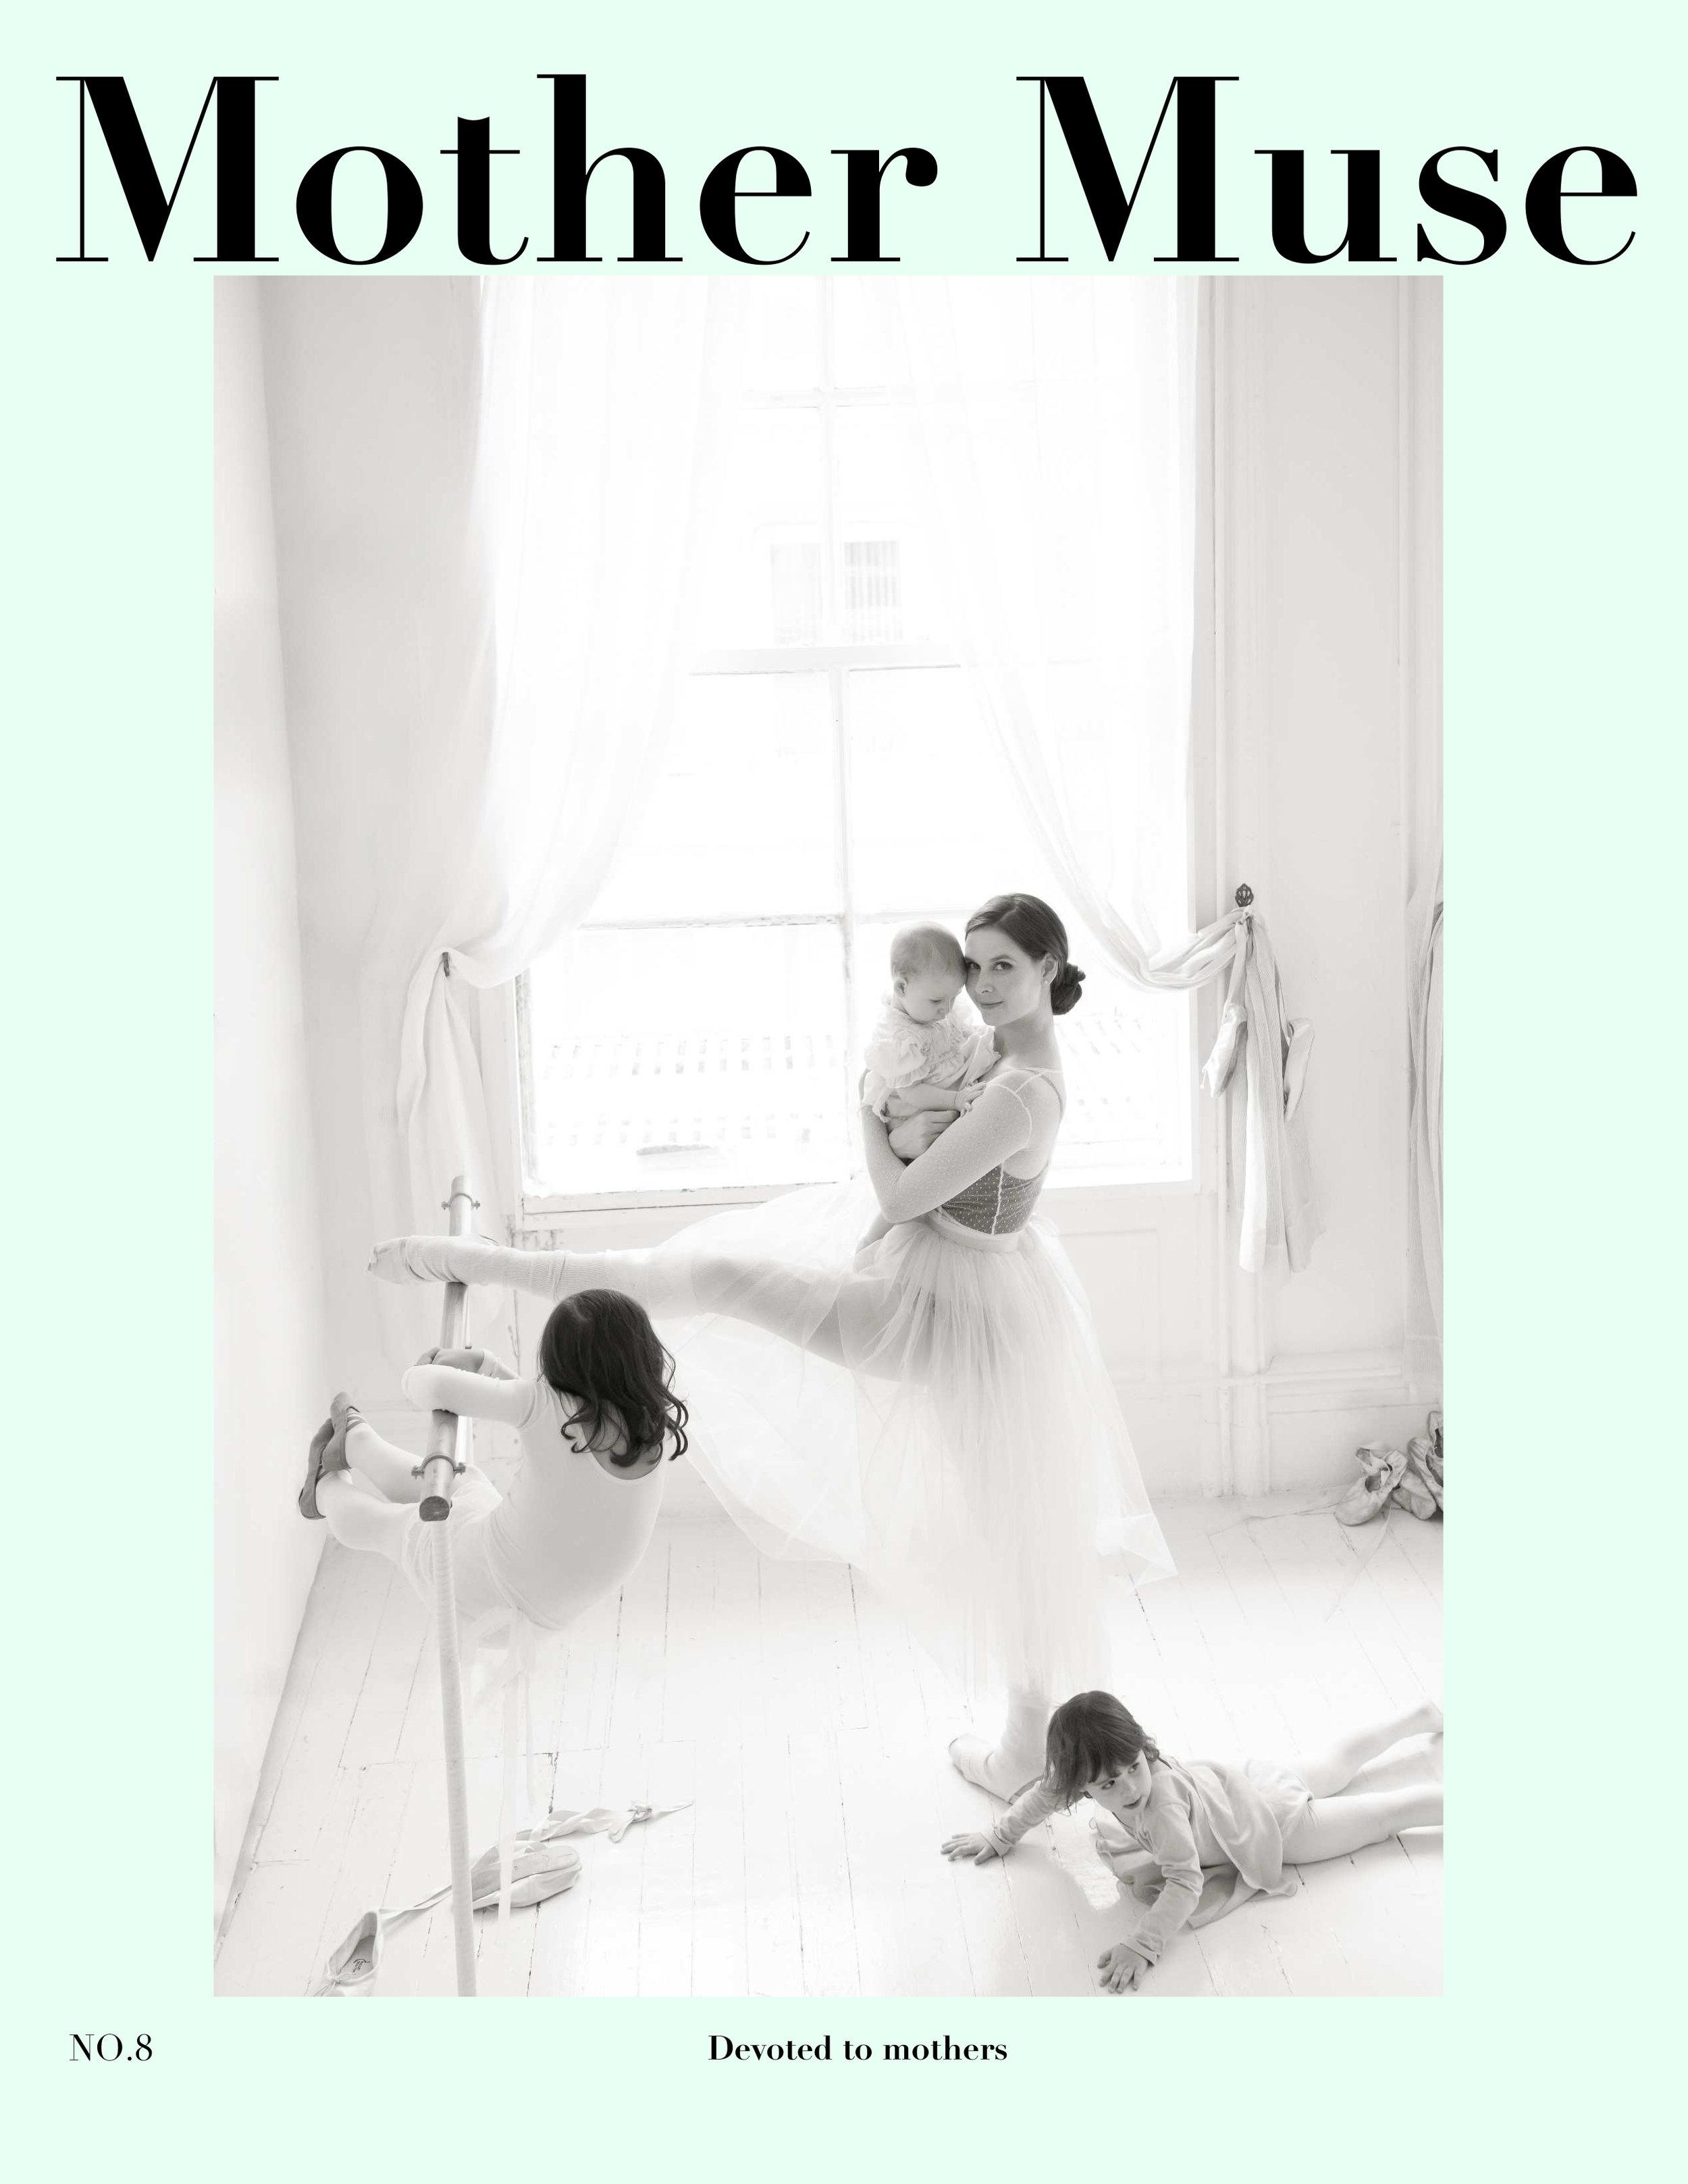 MotherMuse-11-1 (1).JPG